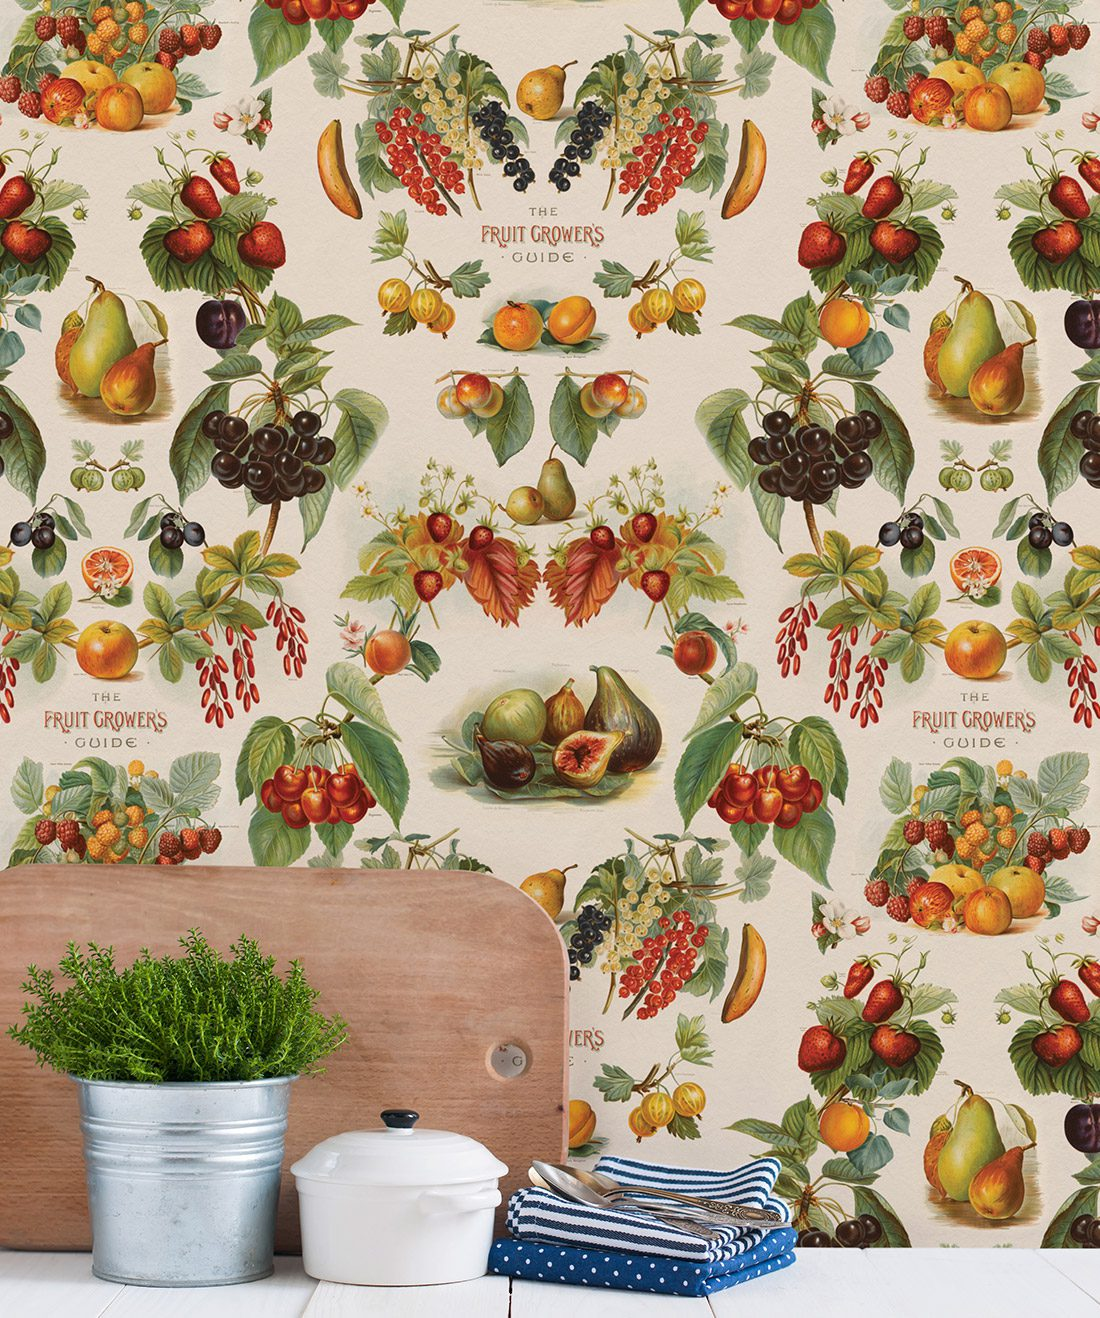 Fruit Growers Guide Wallpaper